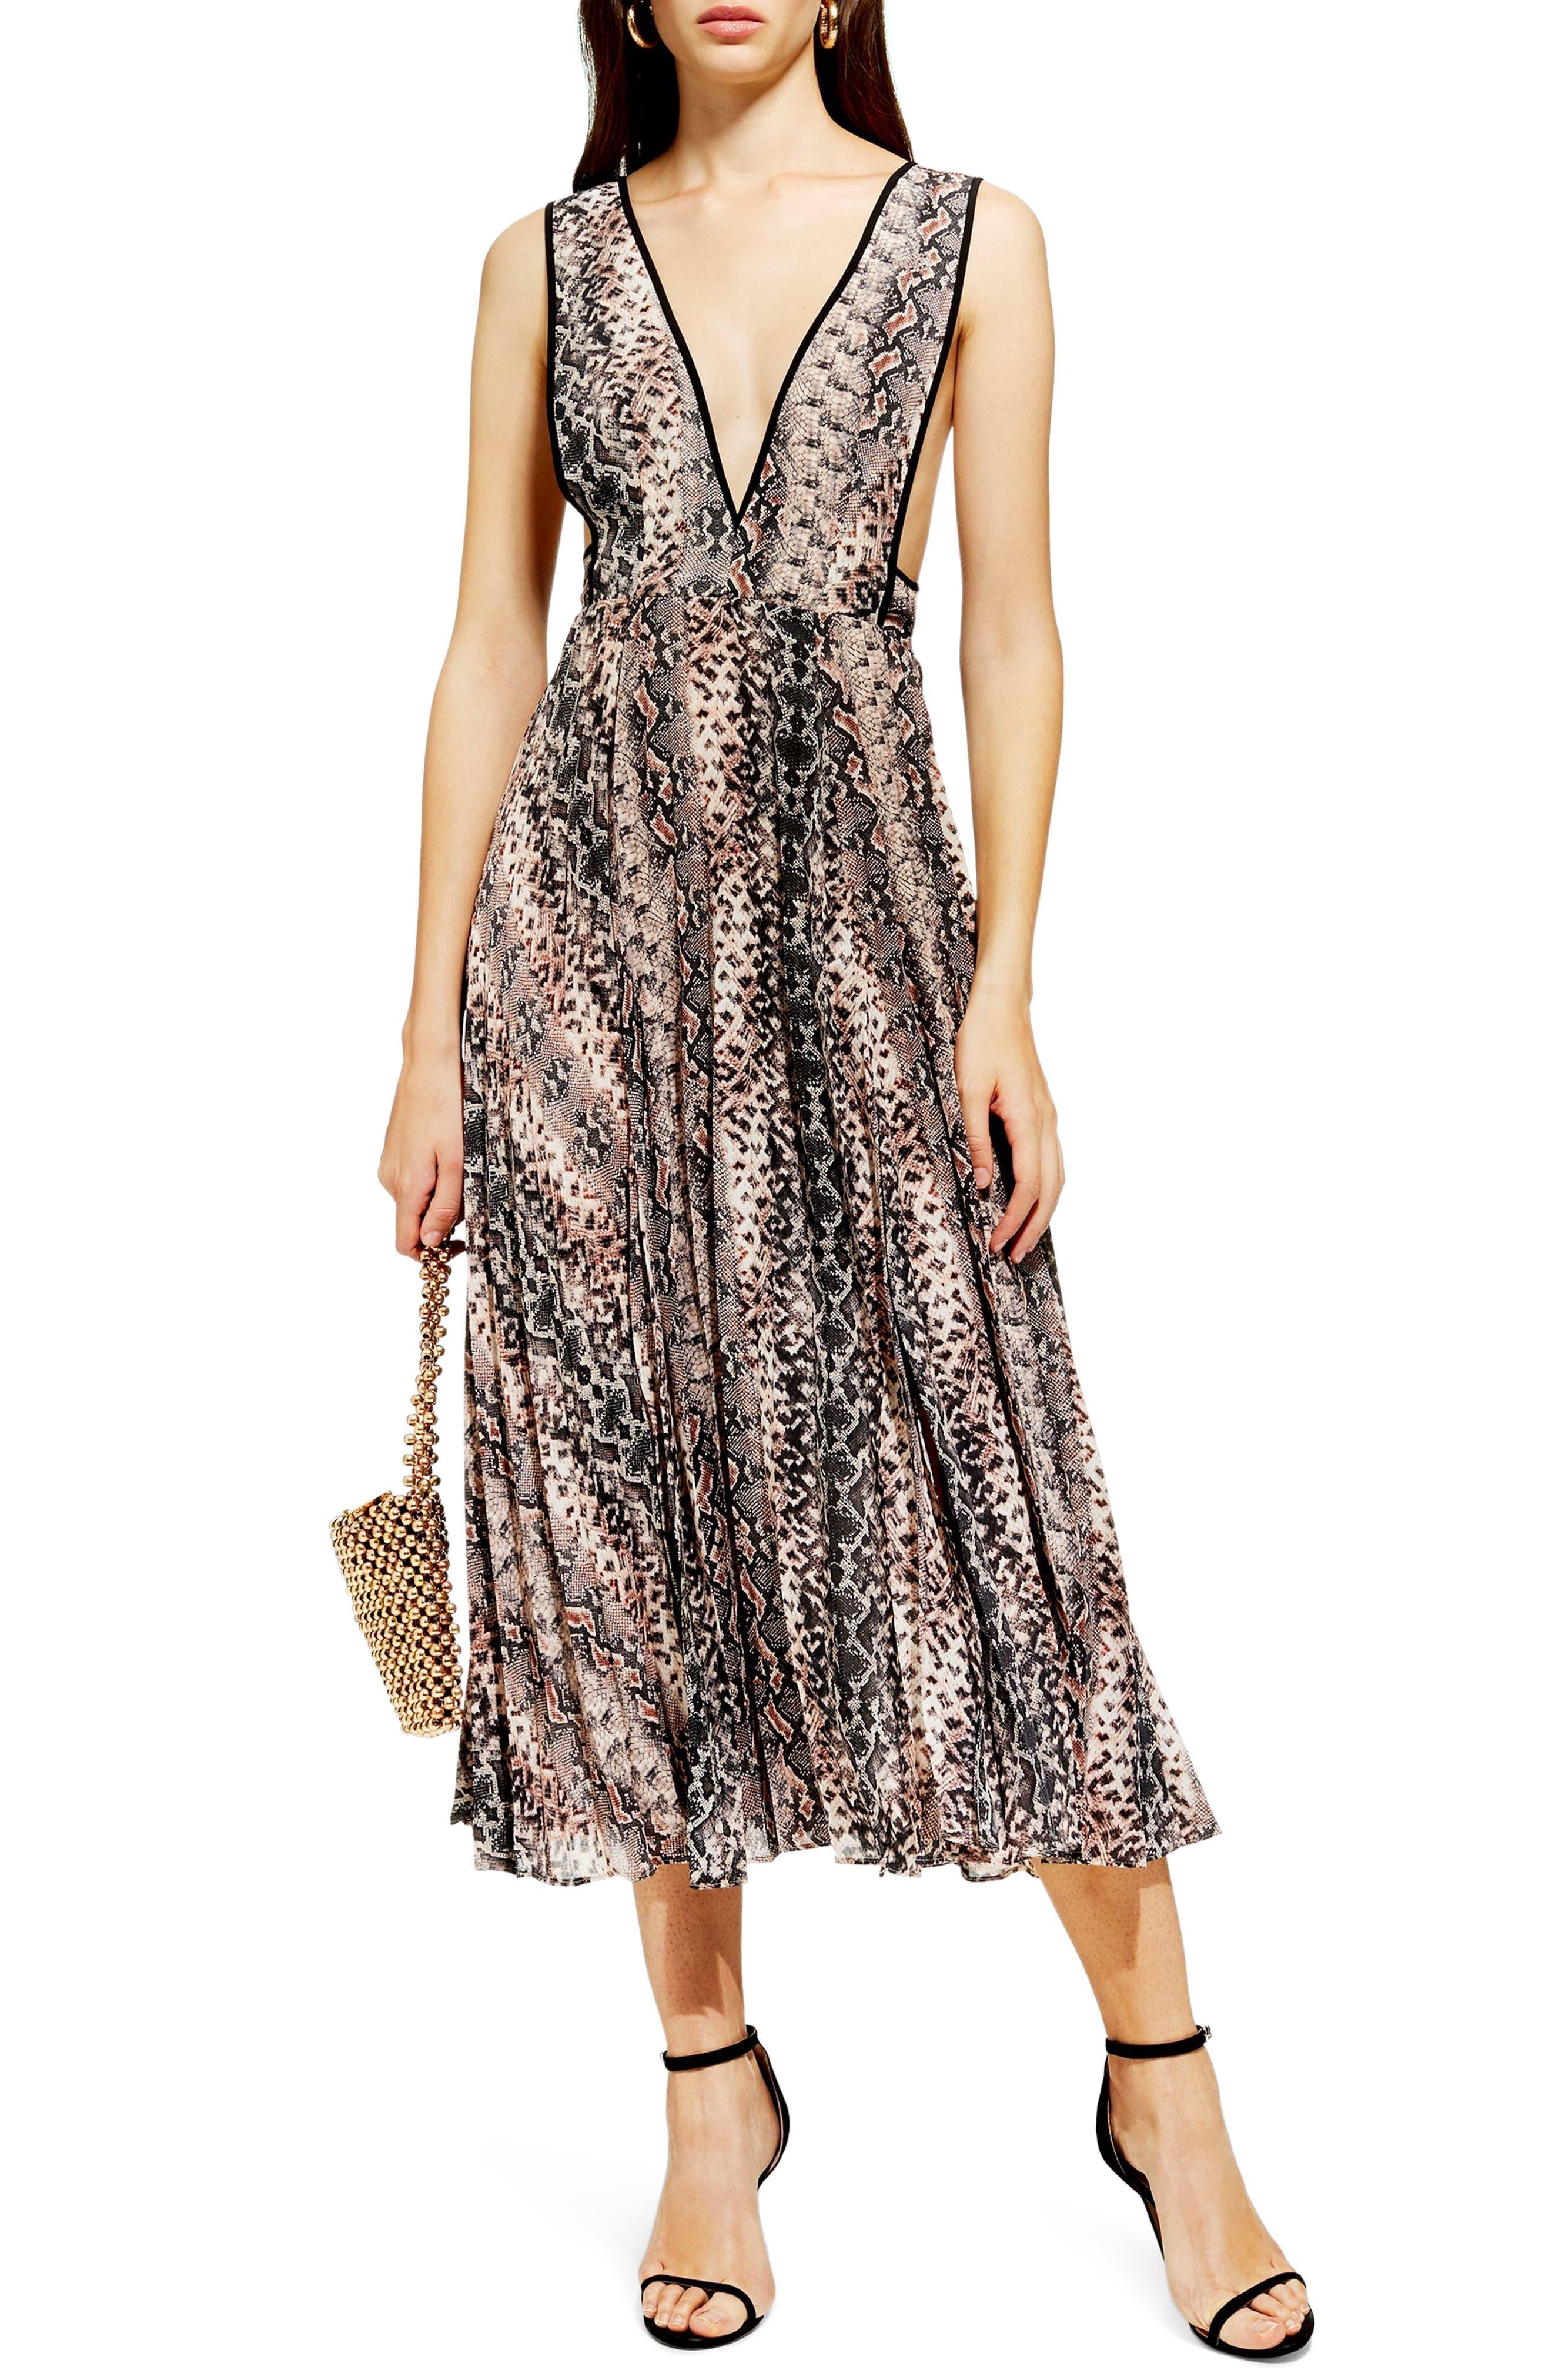 Topshop Snake Print Pleated Dress, US (fits like 2-4) - Pink